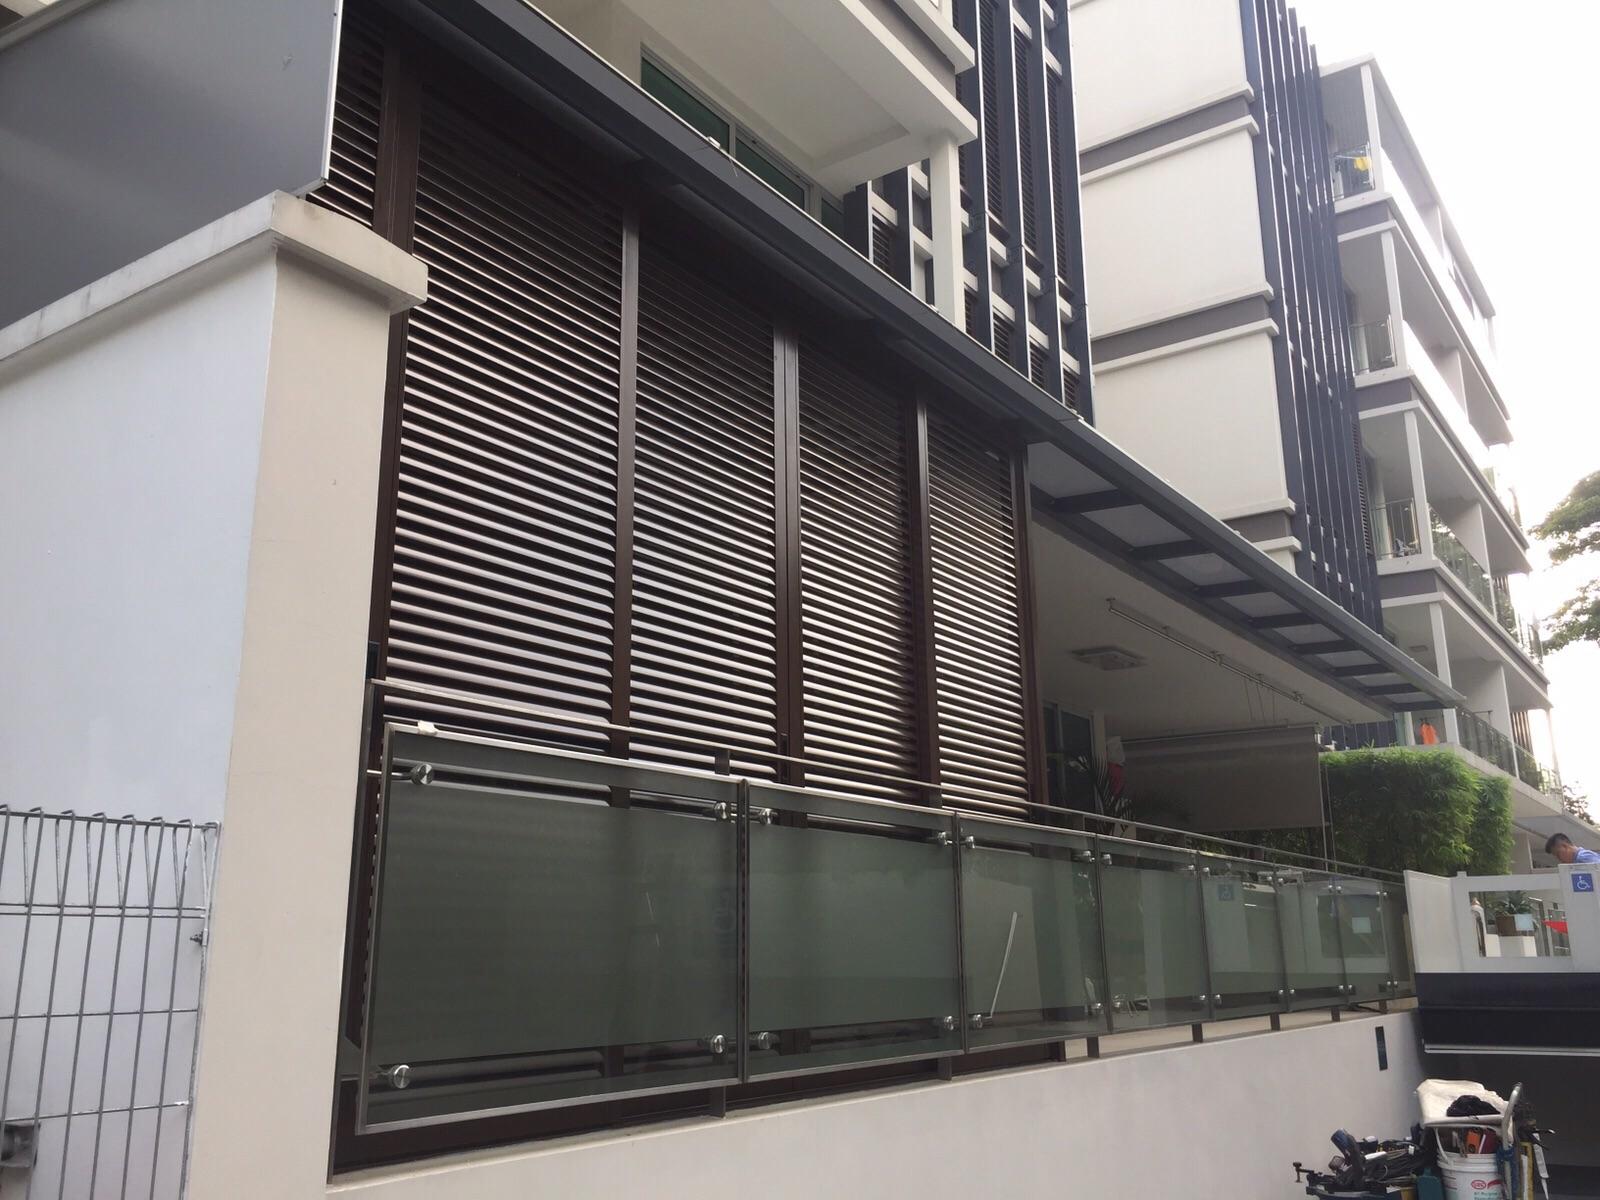 Surface Applied Aluminum Composite Panel : Polycarbonate shelter spacedor marketing pte ltd